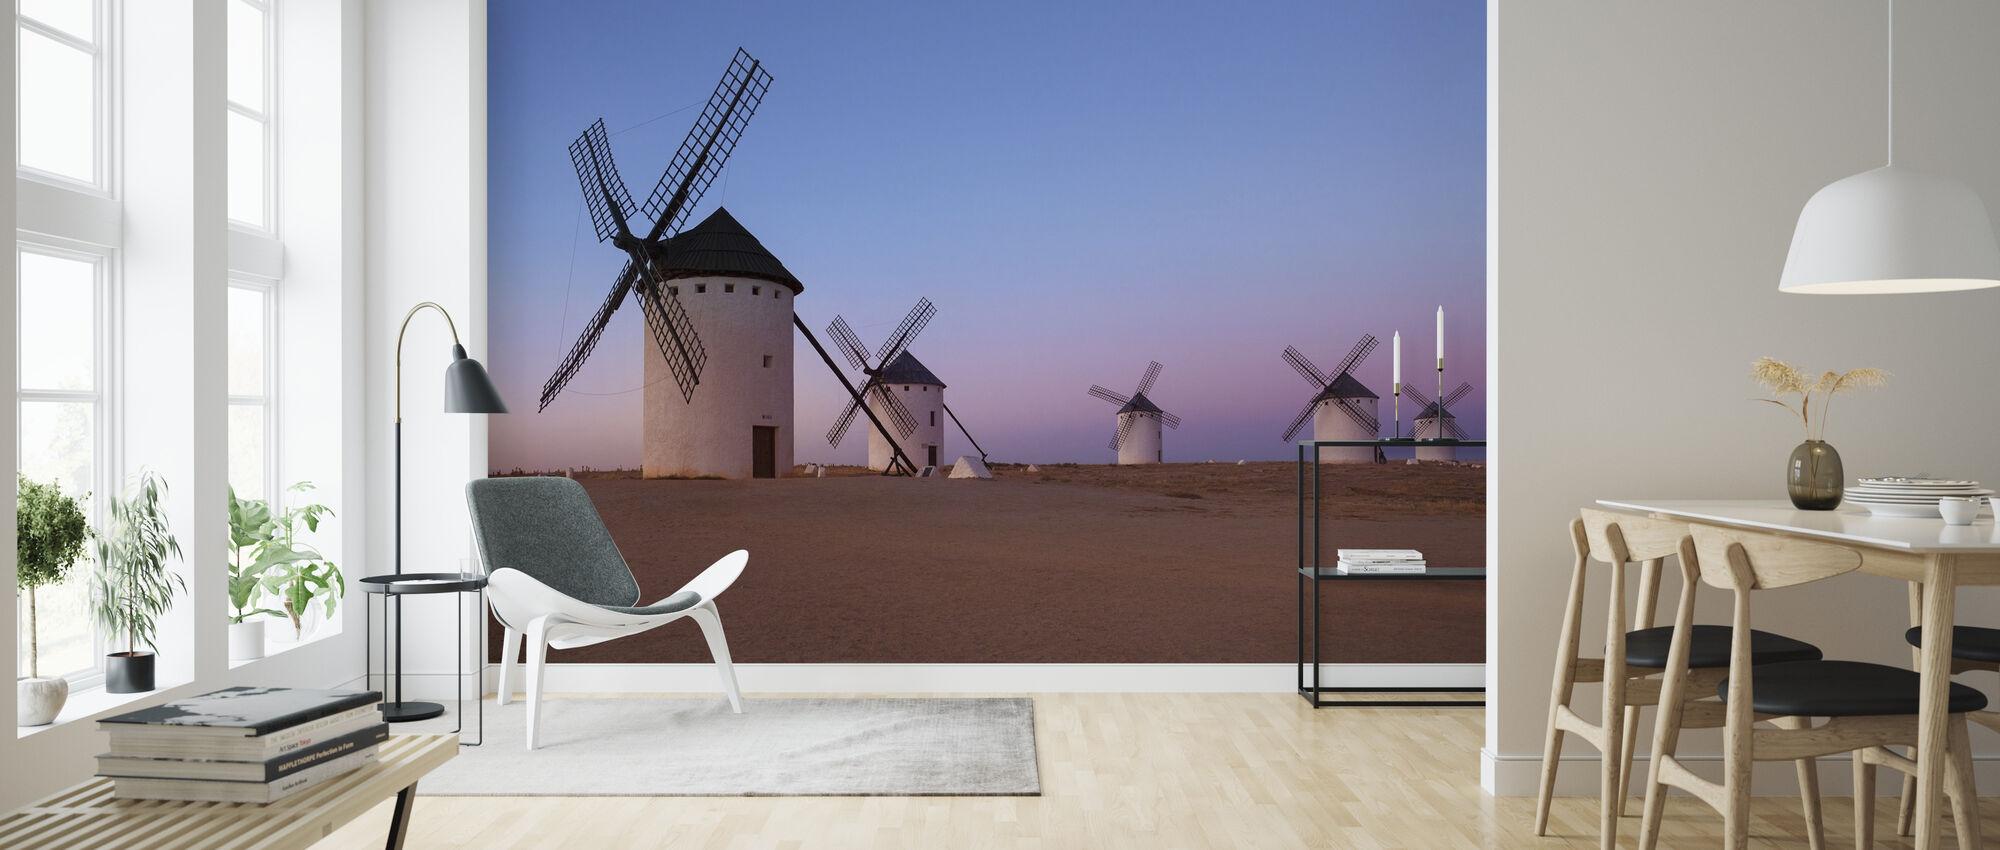 Windmolens van La Mancha - Behang - Woonkamer